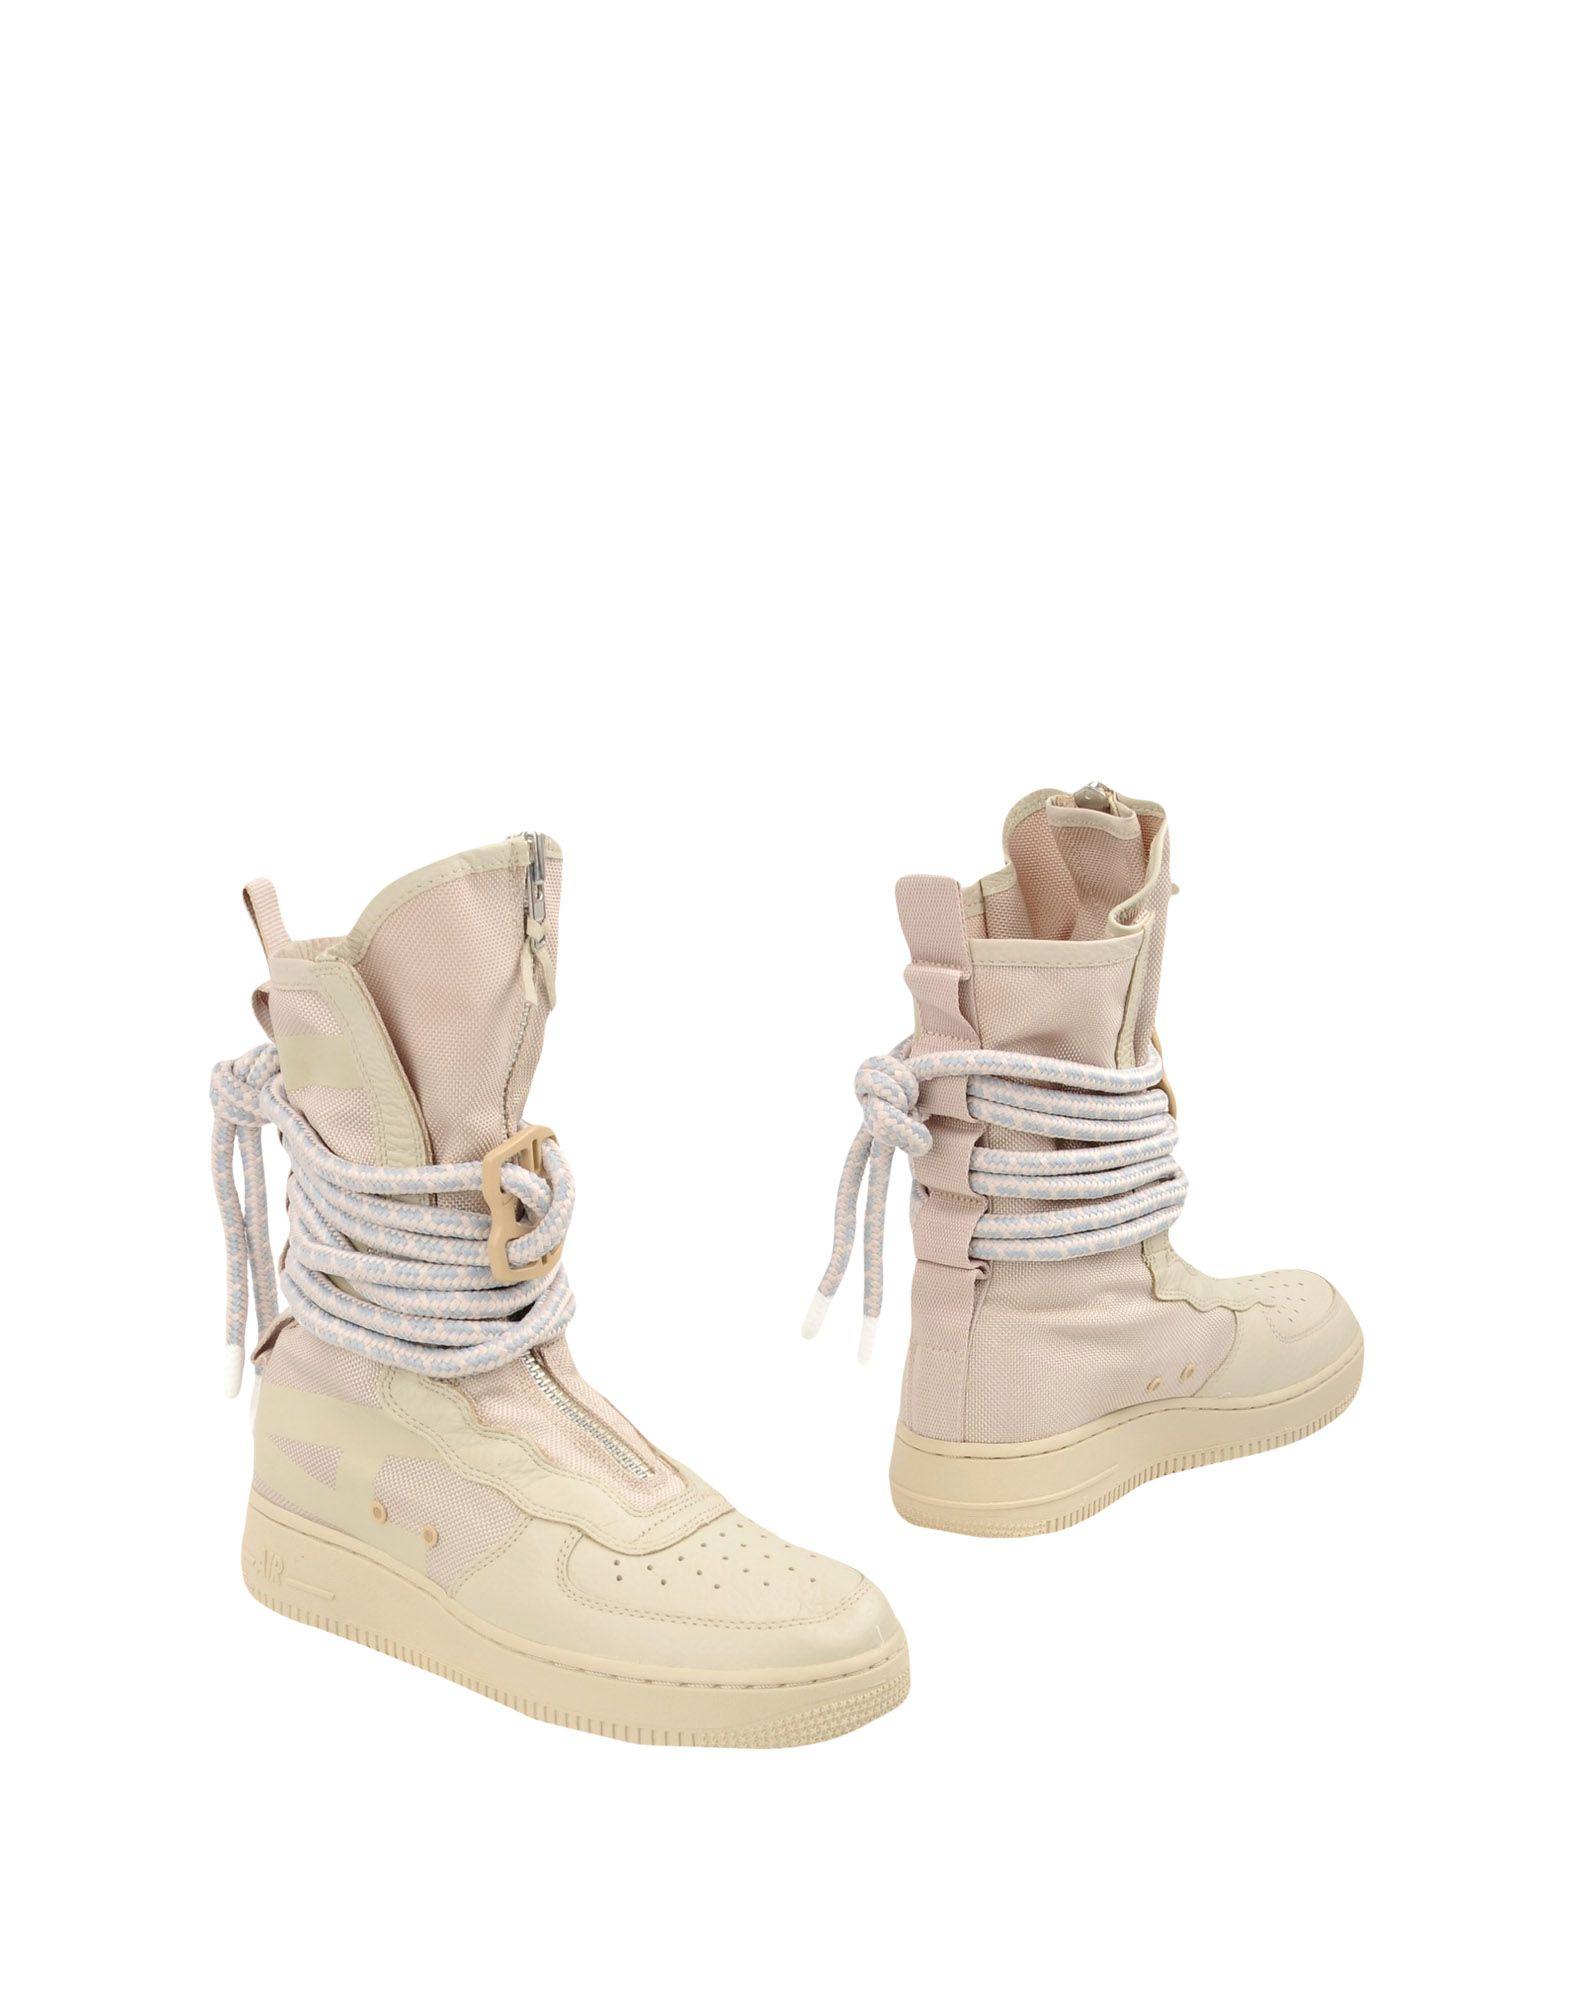 Stivaletti Nike  Sf 11395944WP Af1 Hi - Donna - 11395944WP Sf 6c6417